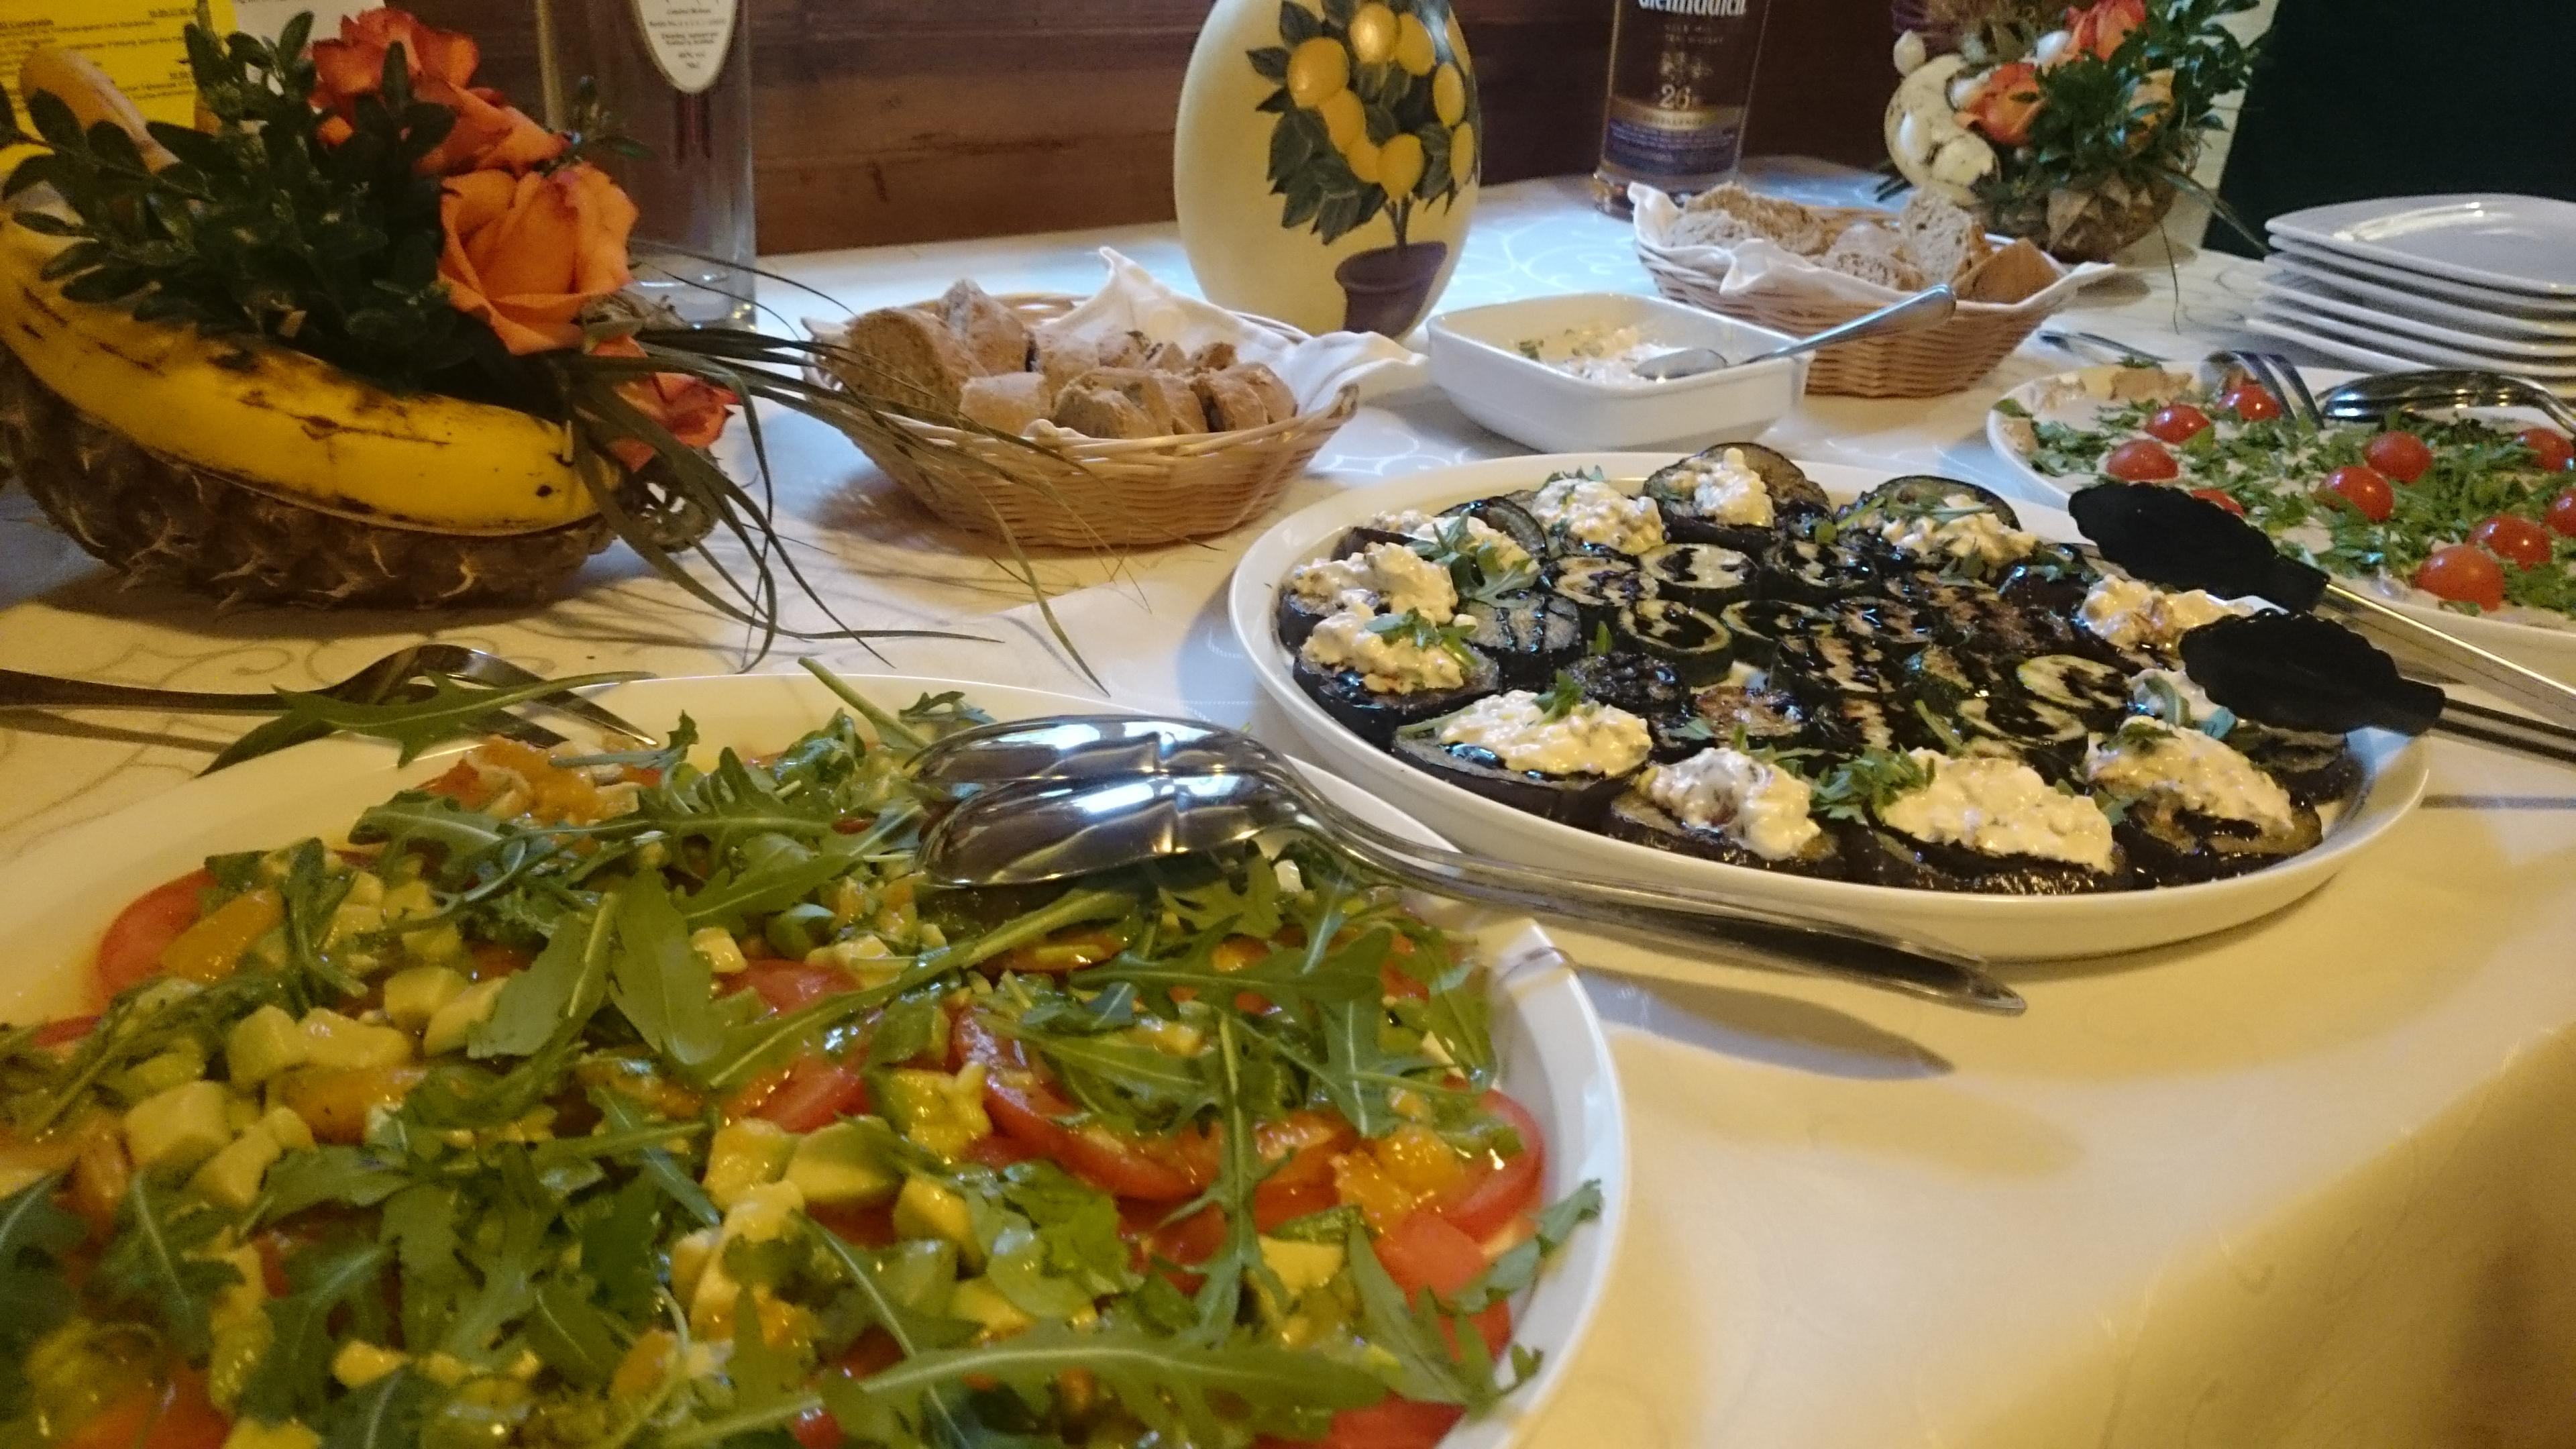 kochworkshop sommer salate dressings eben leichte k che kleene sch nke. Black Bedroom Furniture Sets. Home Design Ideas